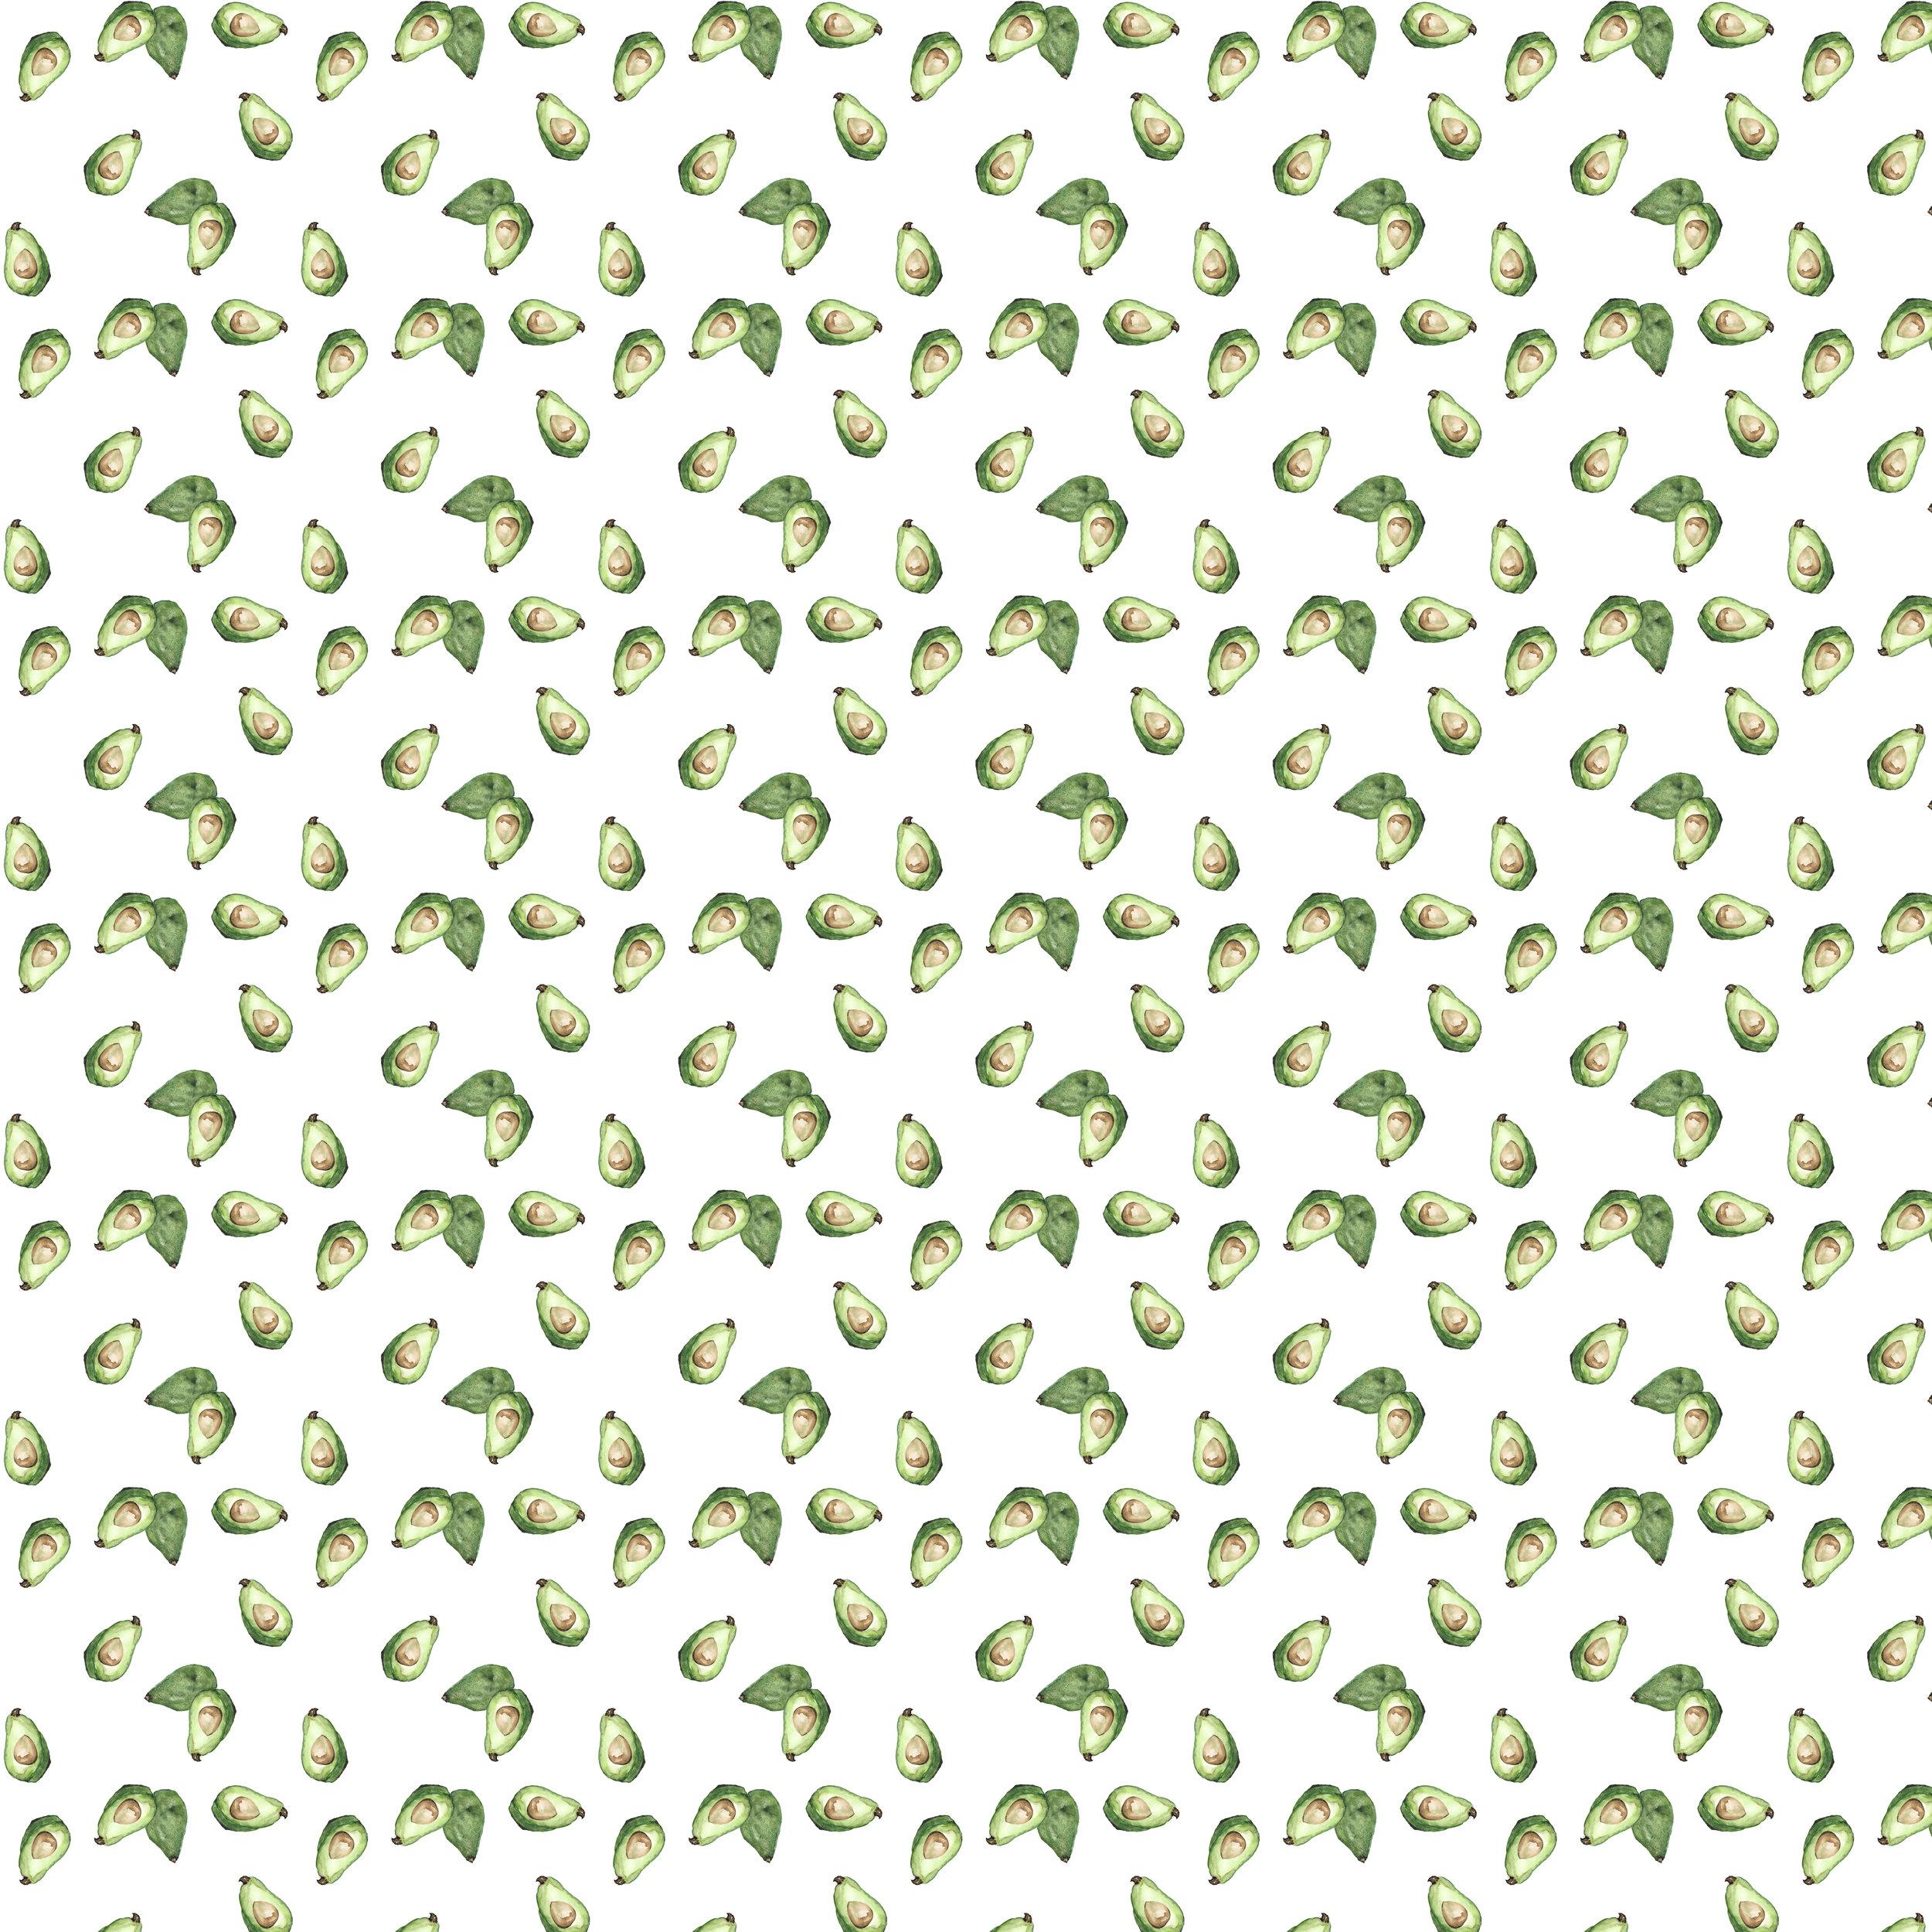 Avocado Pattern.jpg